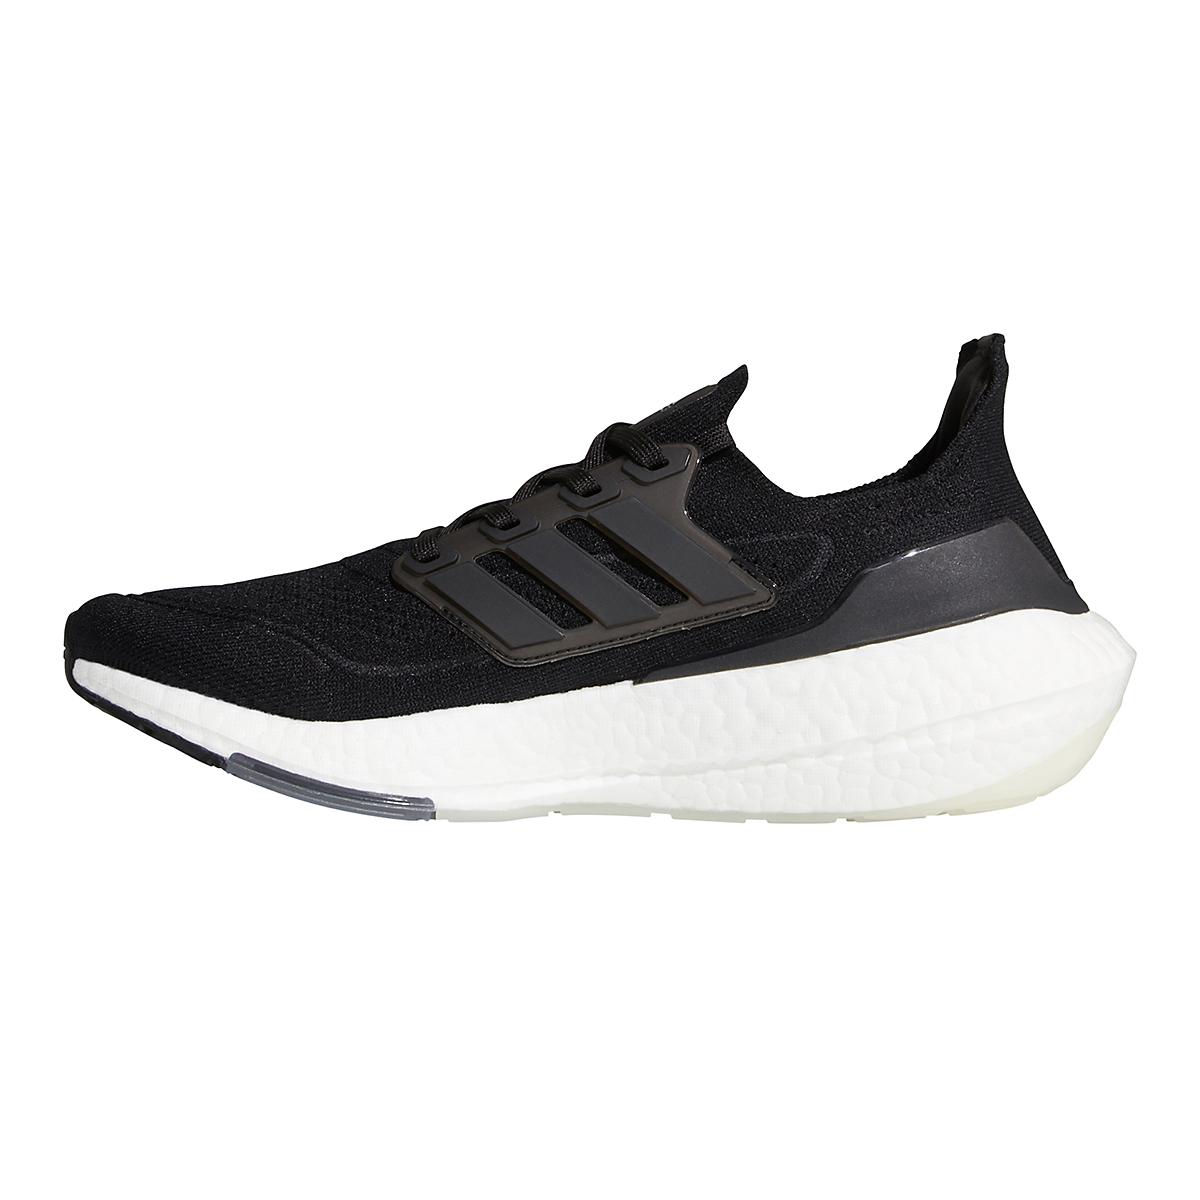 Men's Adidas Ultraboost 21 Running Shoe - Color: Core Black/Grey - Size: 6 - Width: Regular, Core Black/Grey, large, image 2